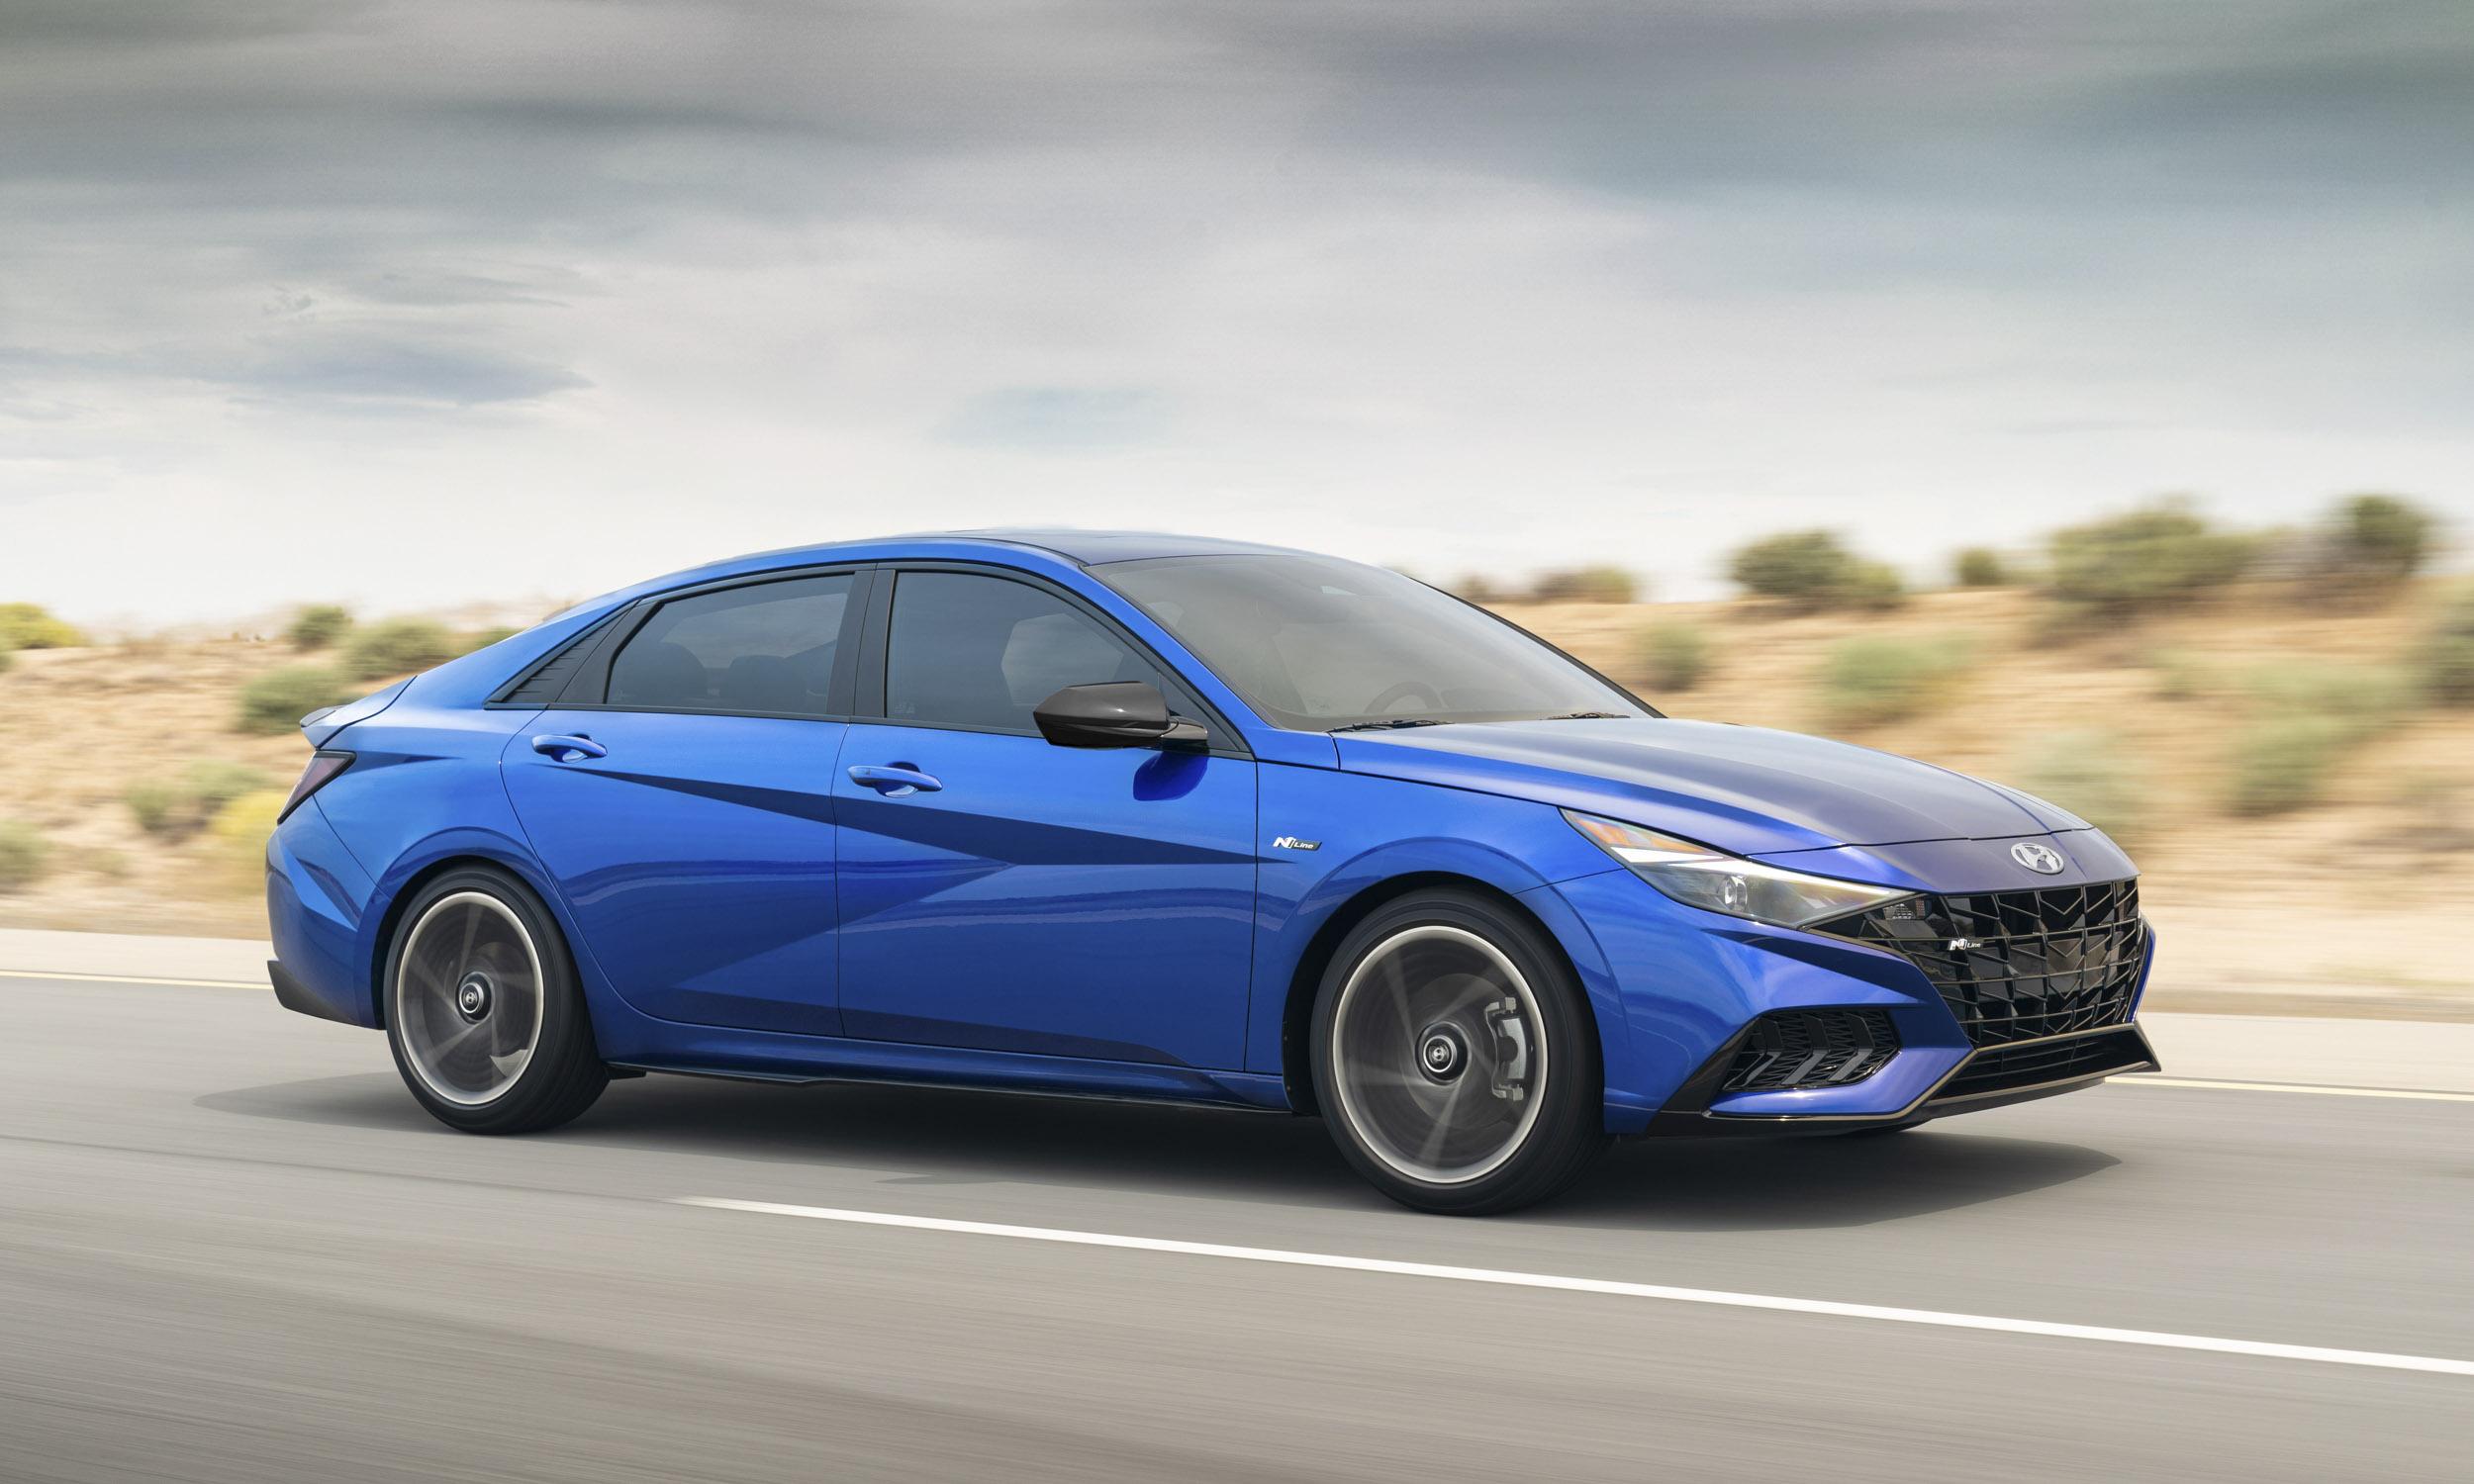 2021 Hyundai Elantra: First Drive Review - » AutoNXT